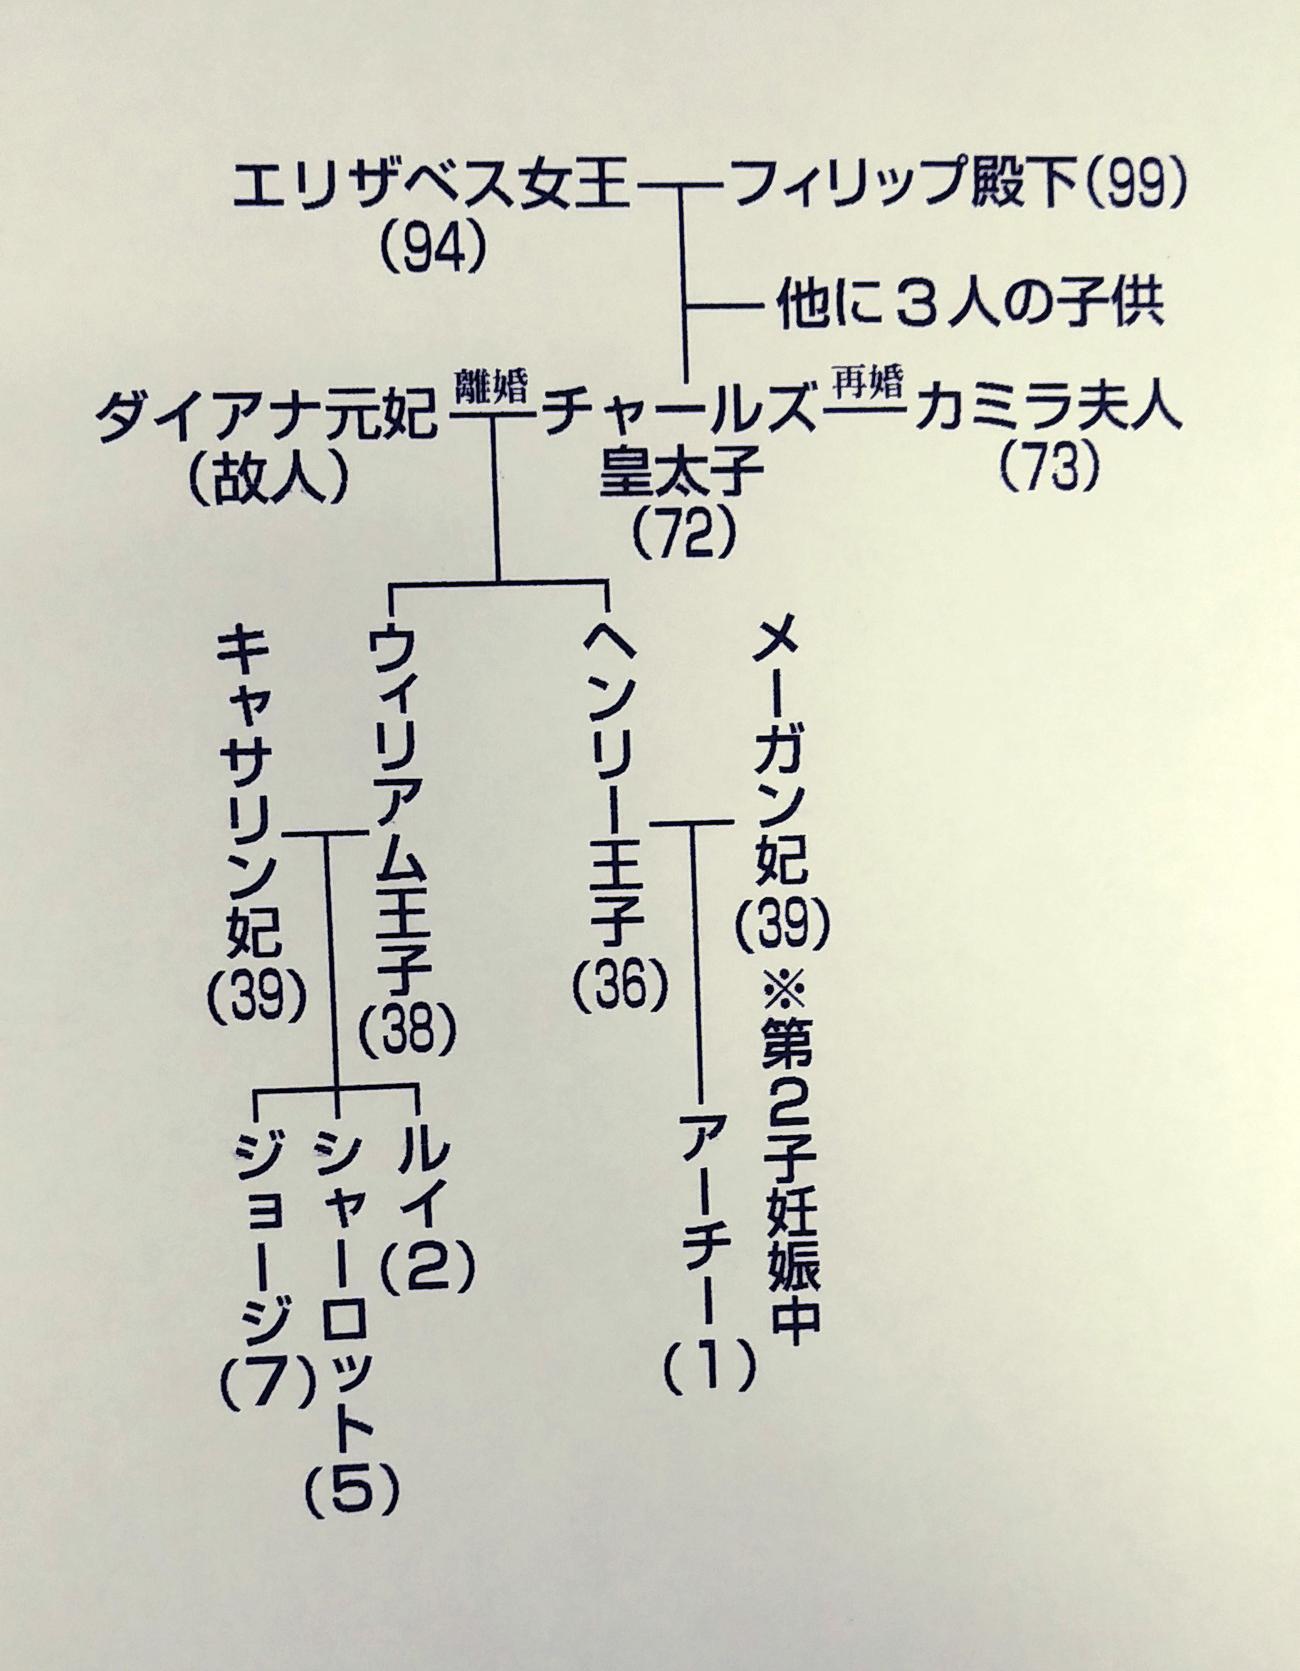 英王室の家系図